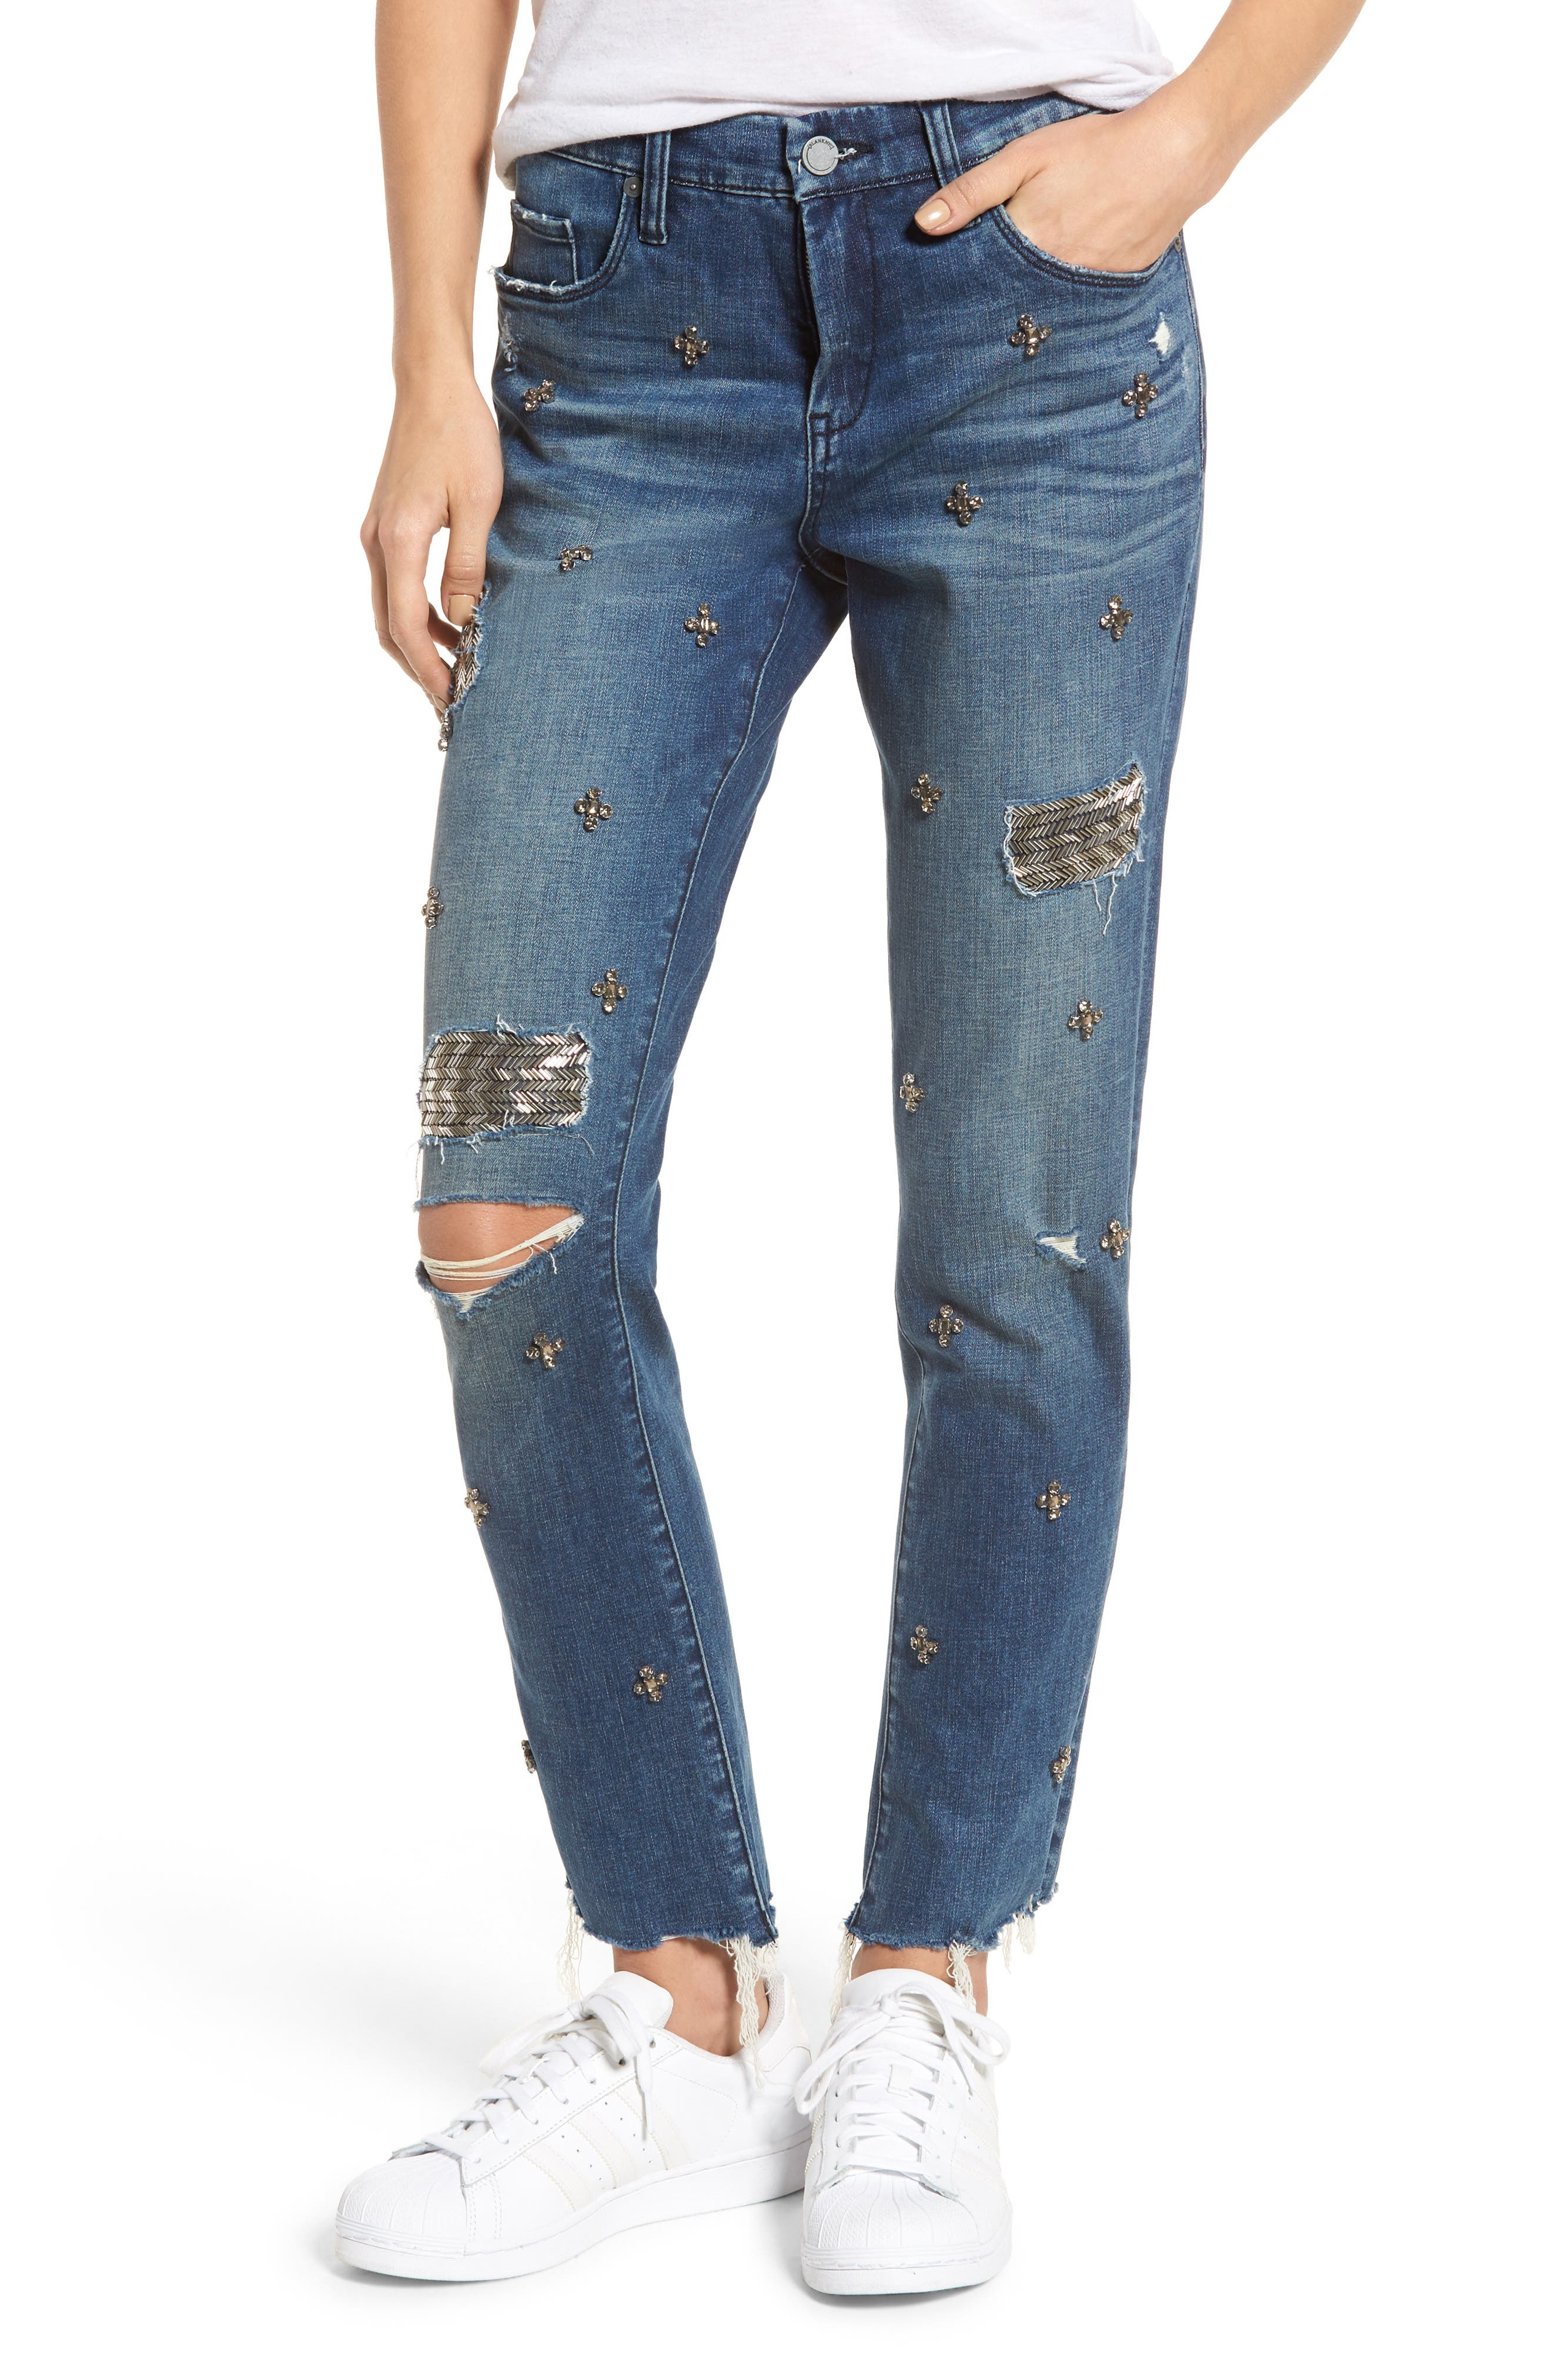 BLANKNYC Charm School Jeweled Girlfriend Jeans